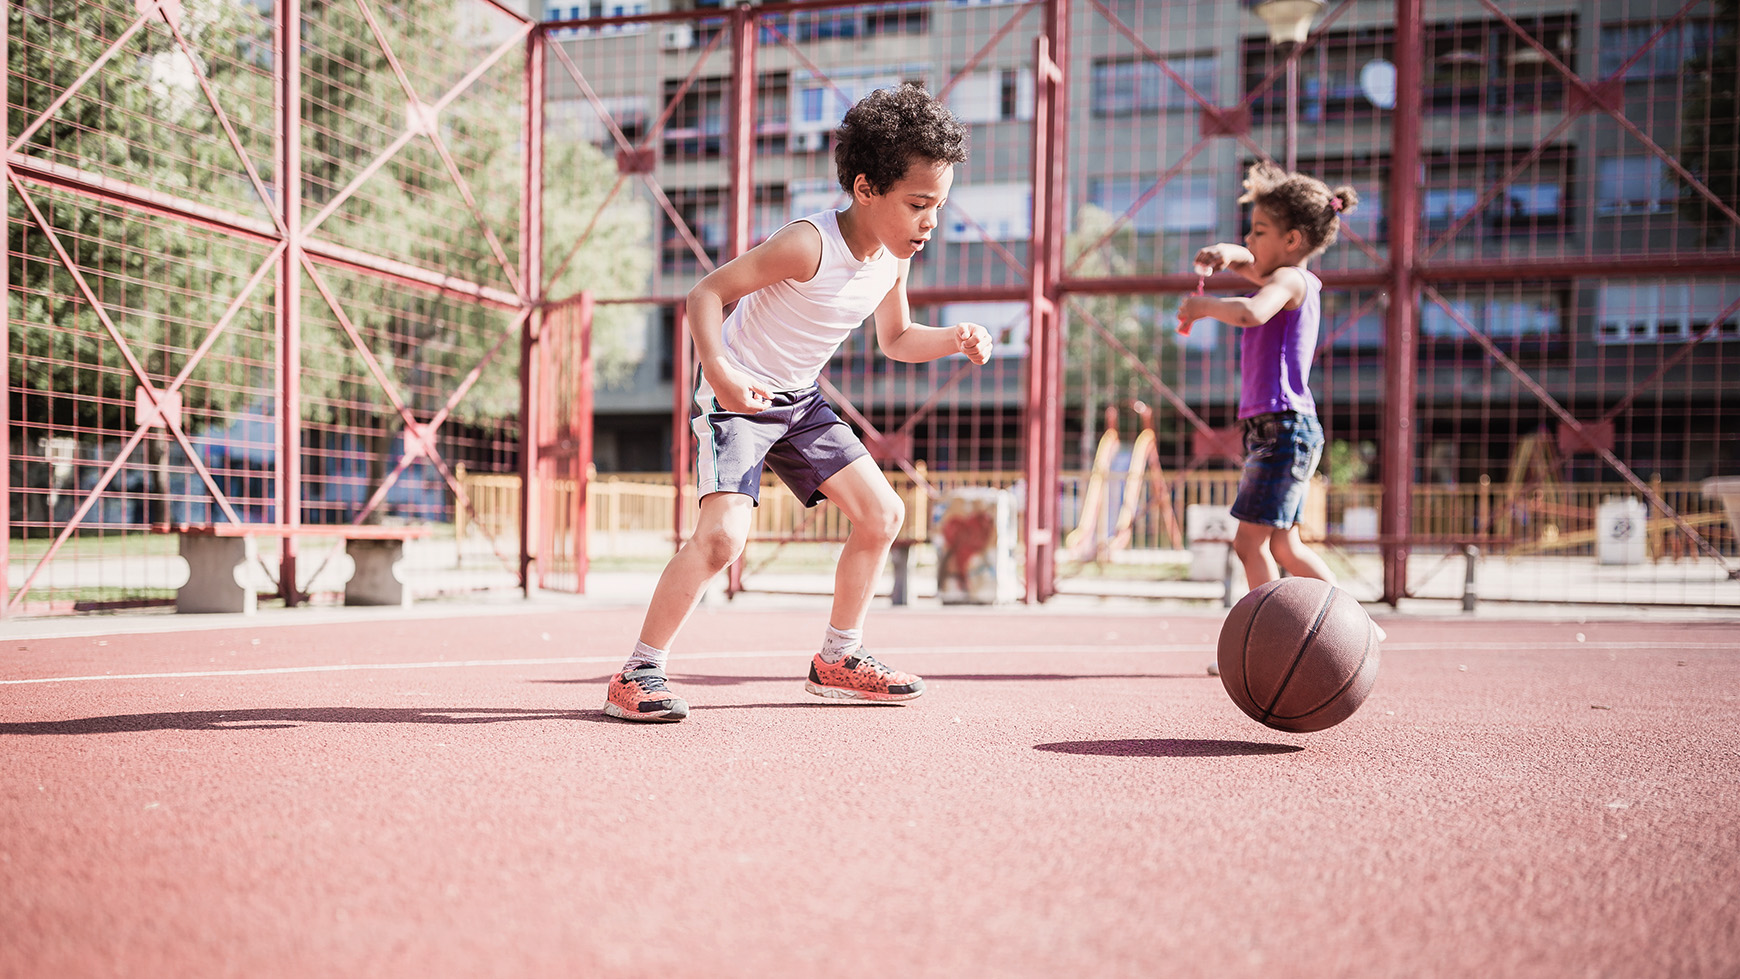 Game For Child Ball Development Coordination Motor Training